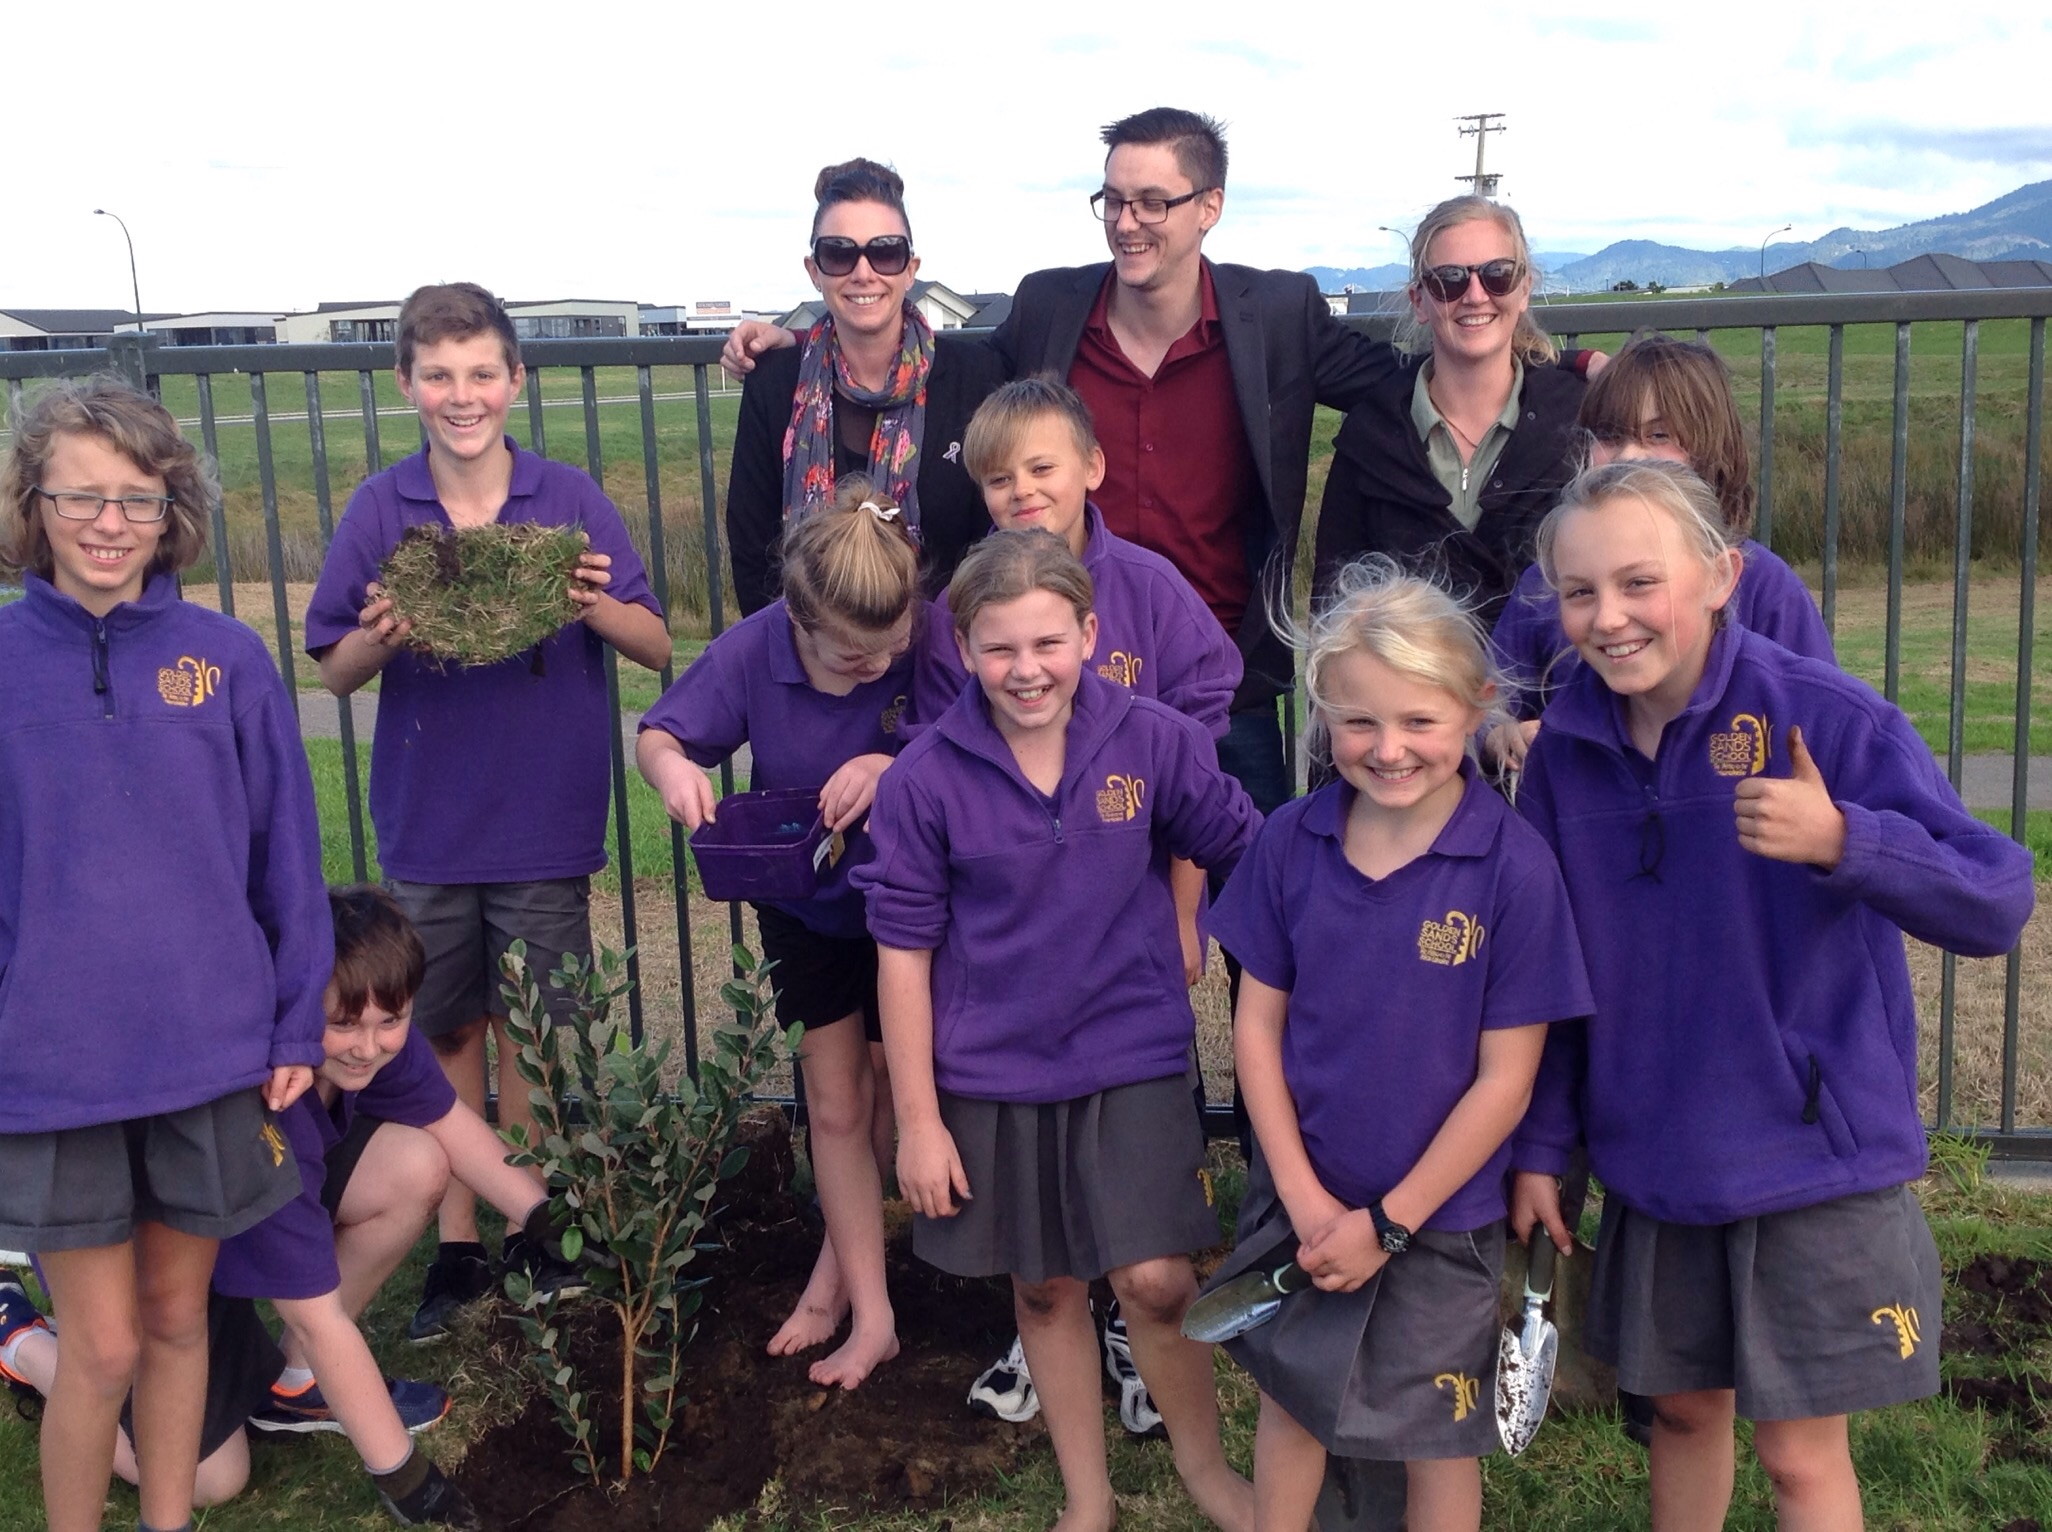 enviro group planting trees